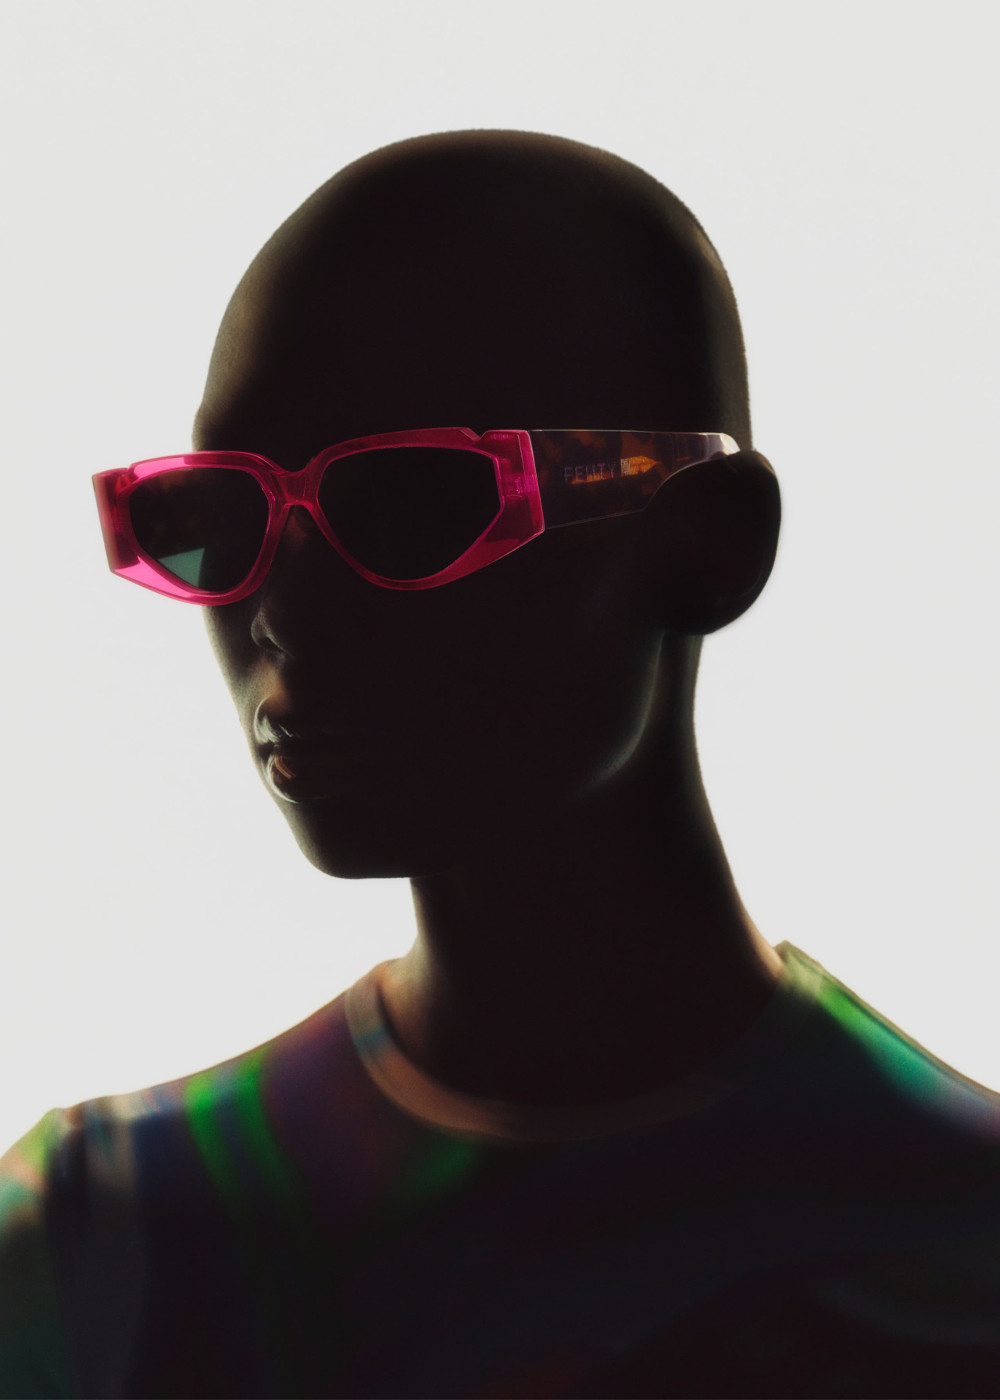 Fenty Hadirkan Koleksi Kacamata Hitam R5-20